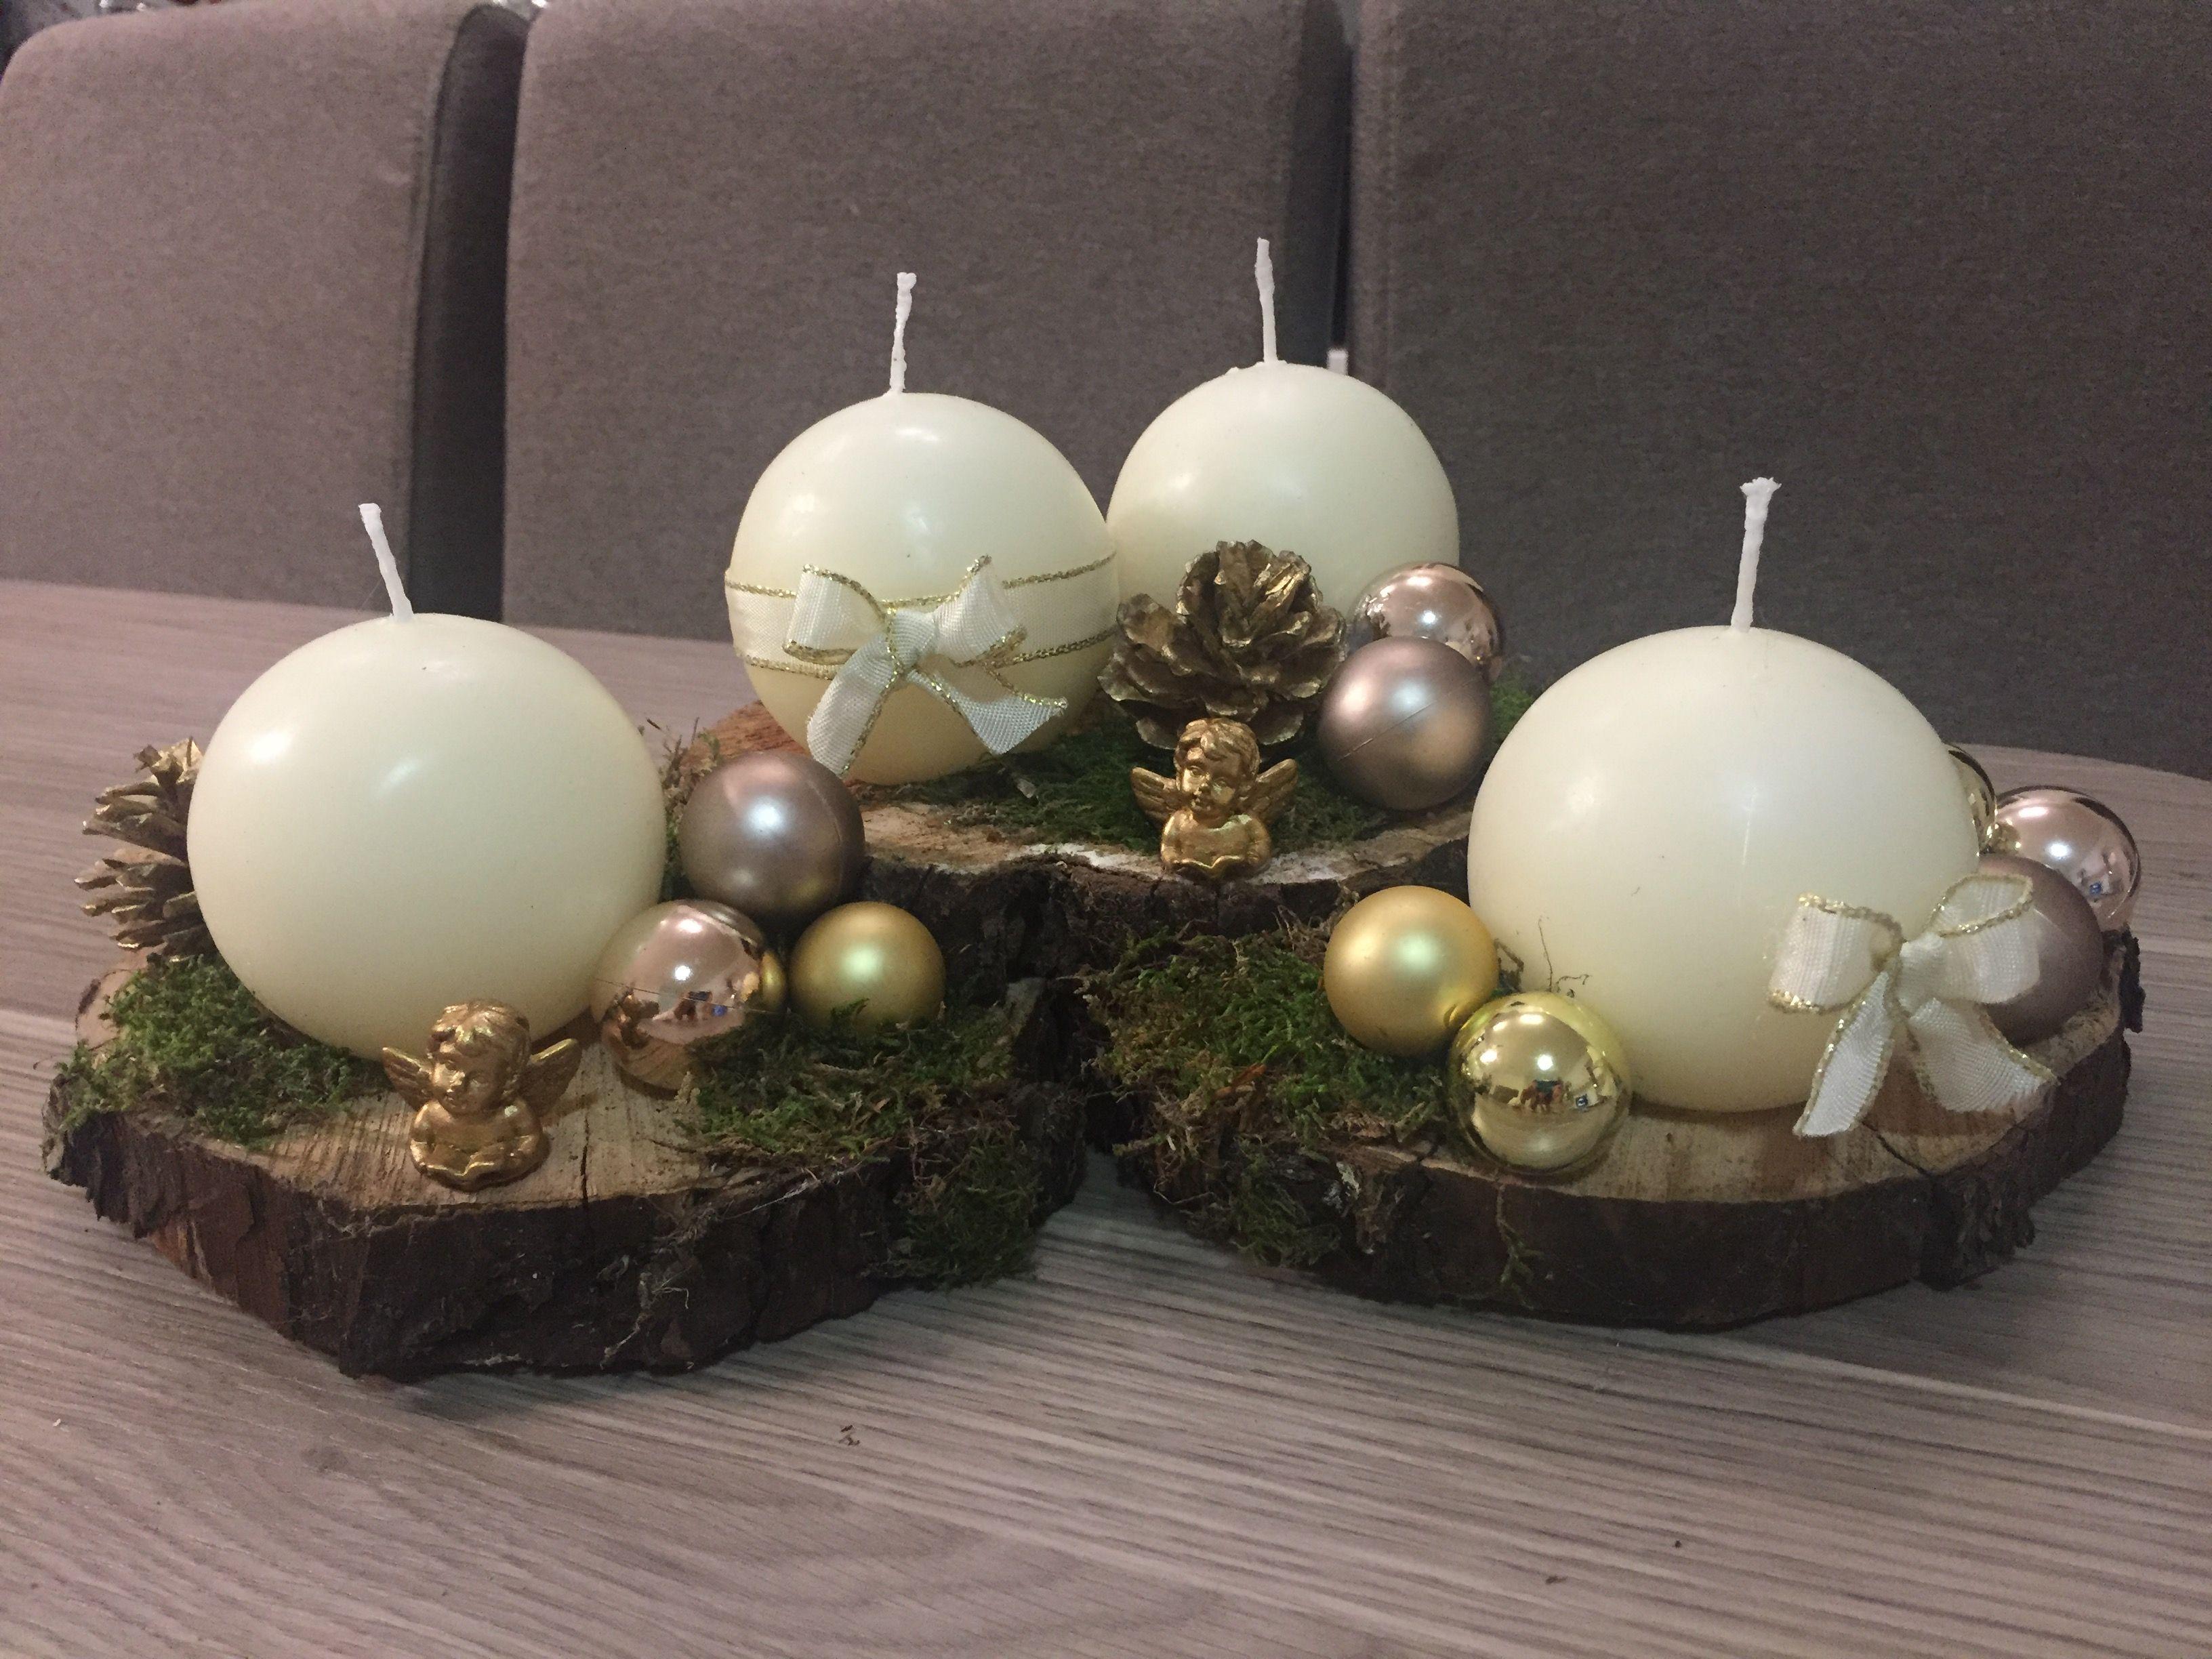 My 2017 homemade advent wreath. Homemade advent wreath